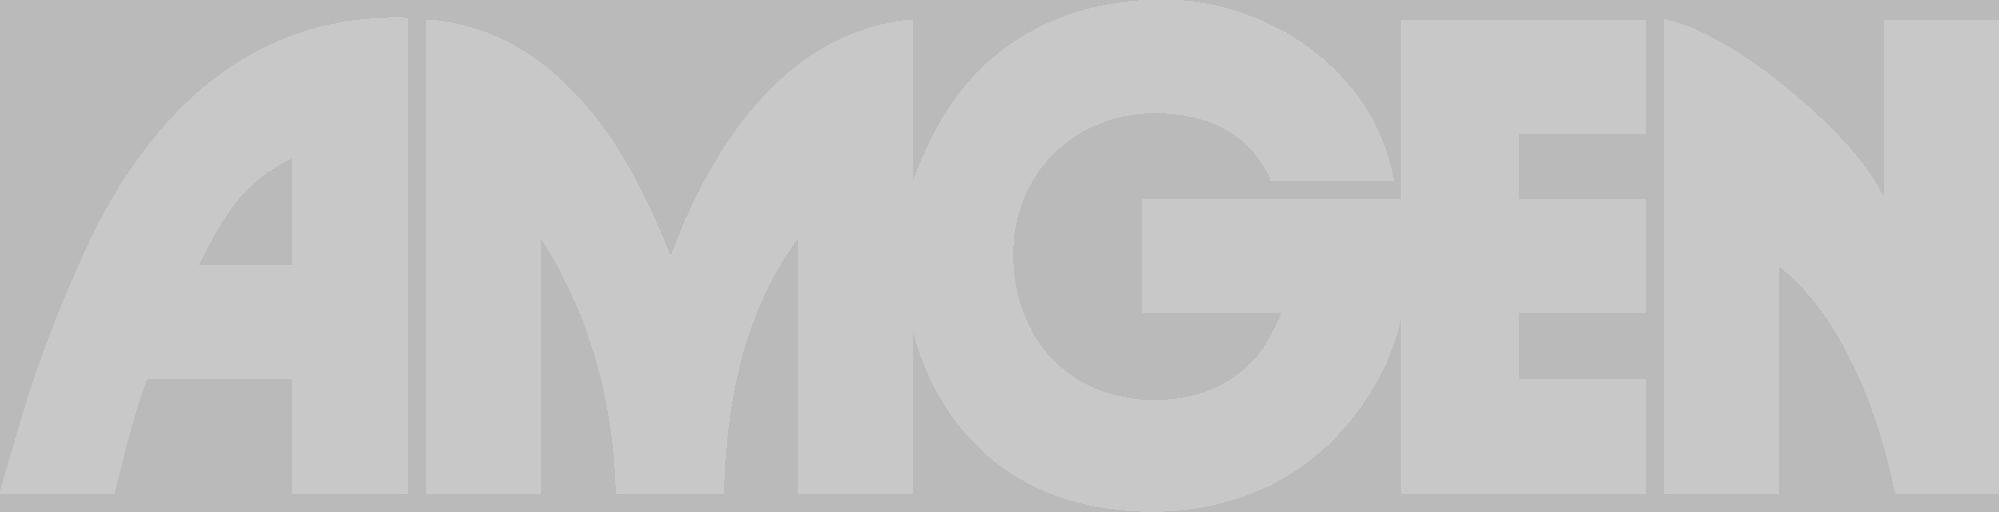 5d80e5ce3510c9047c0490fa_amgen-logo